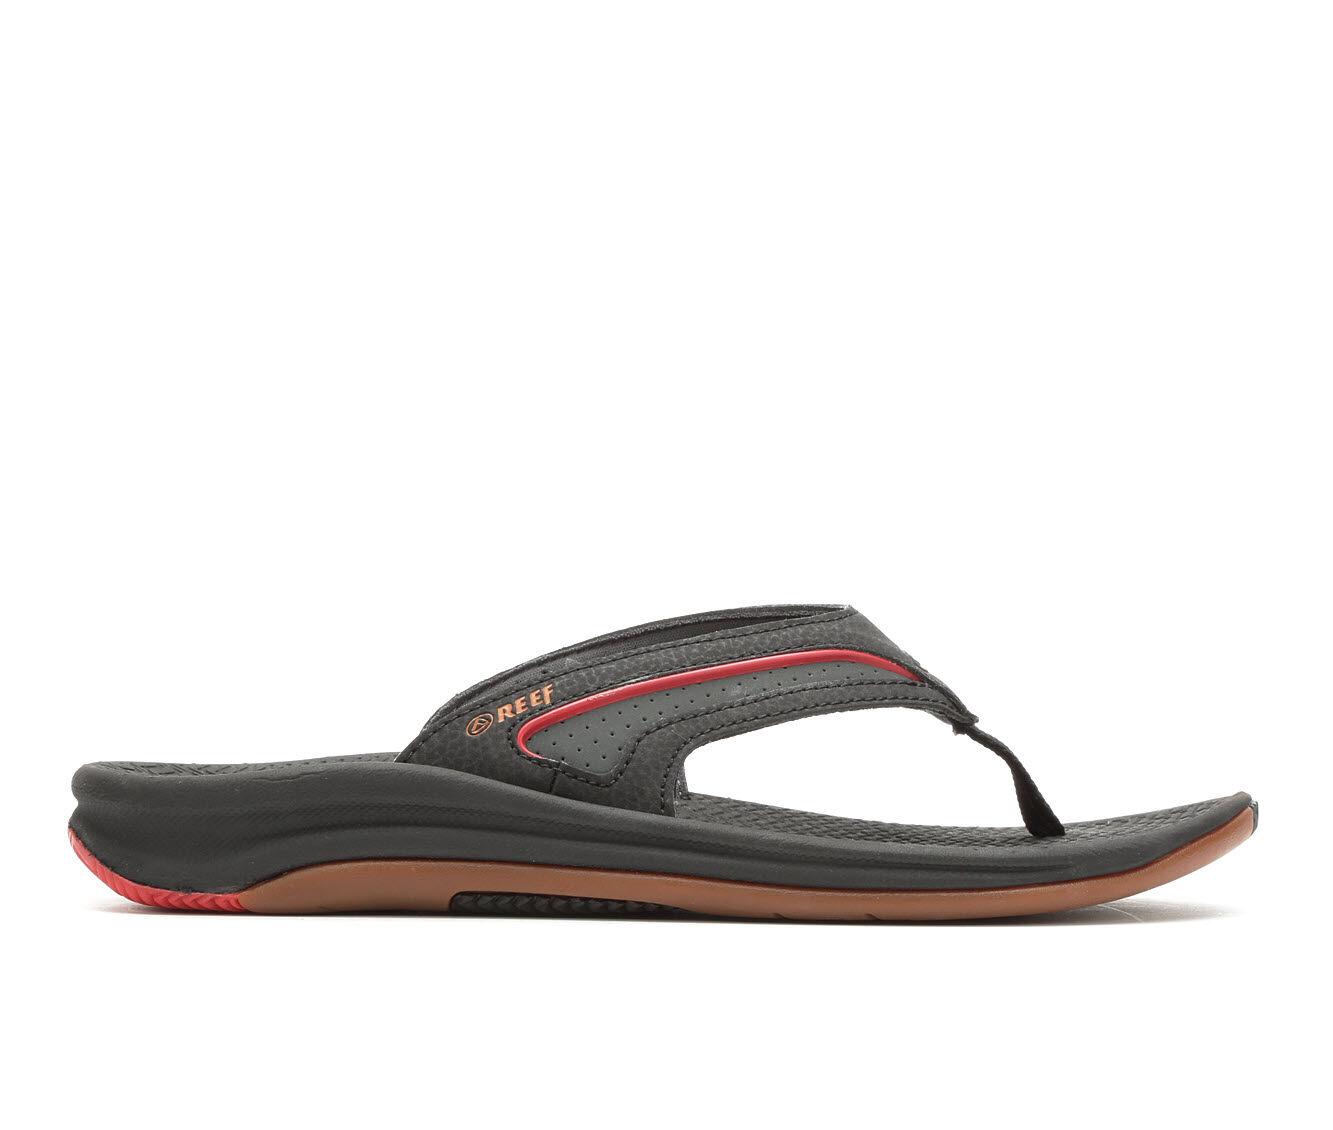 Men's Reef Flex Flip-Flops Black/Gum/Red